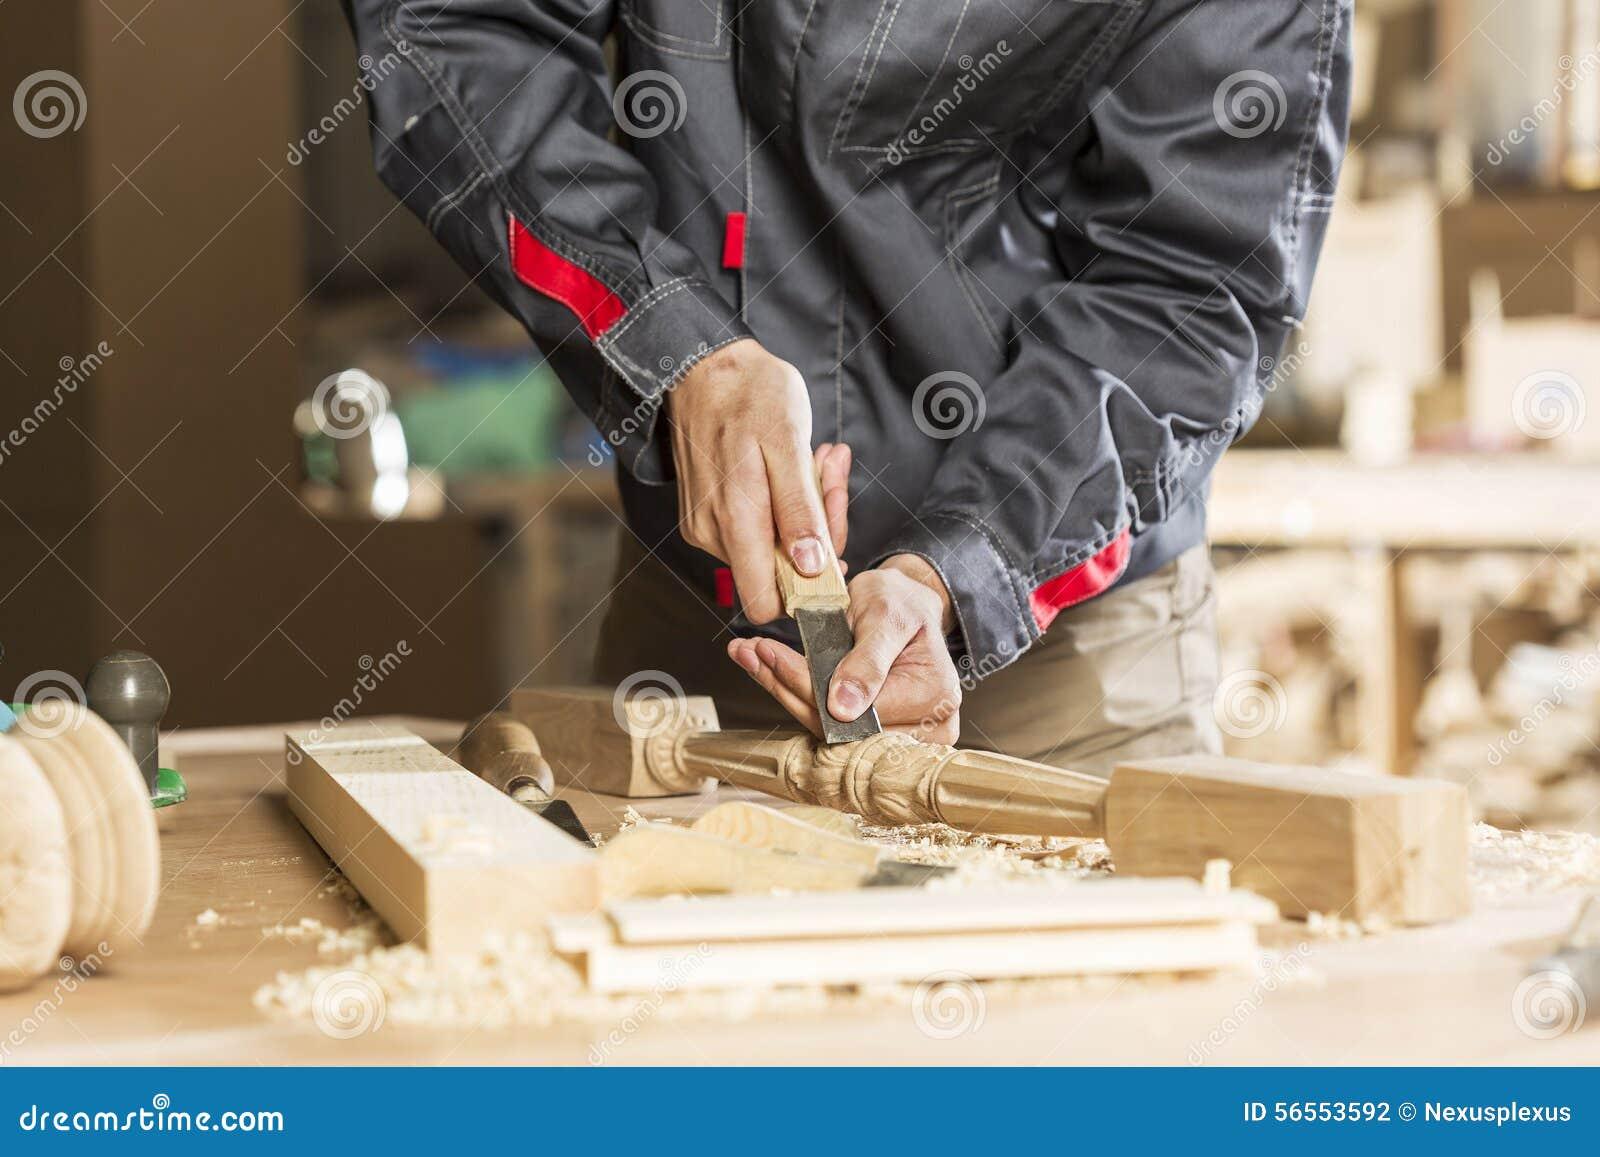 Download οι τραχιές στρογγυλές διαδρομές κούτσουρων εφαρμογής ξυλουργών λειτουργούν Στοκ Εικόνες - εικόνα από σύνολο, ξύλινος: 56553592